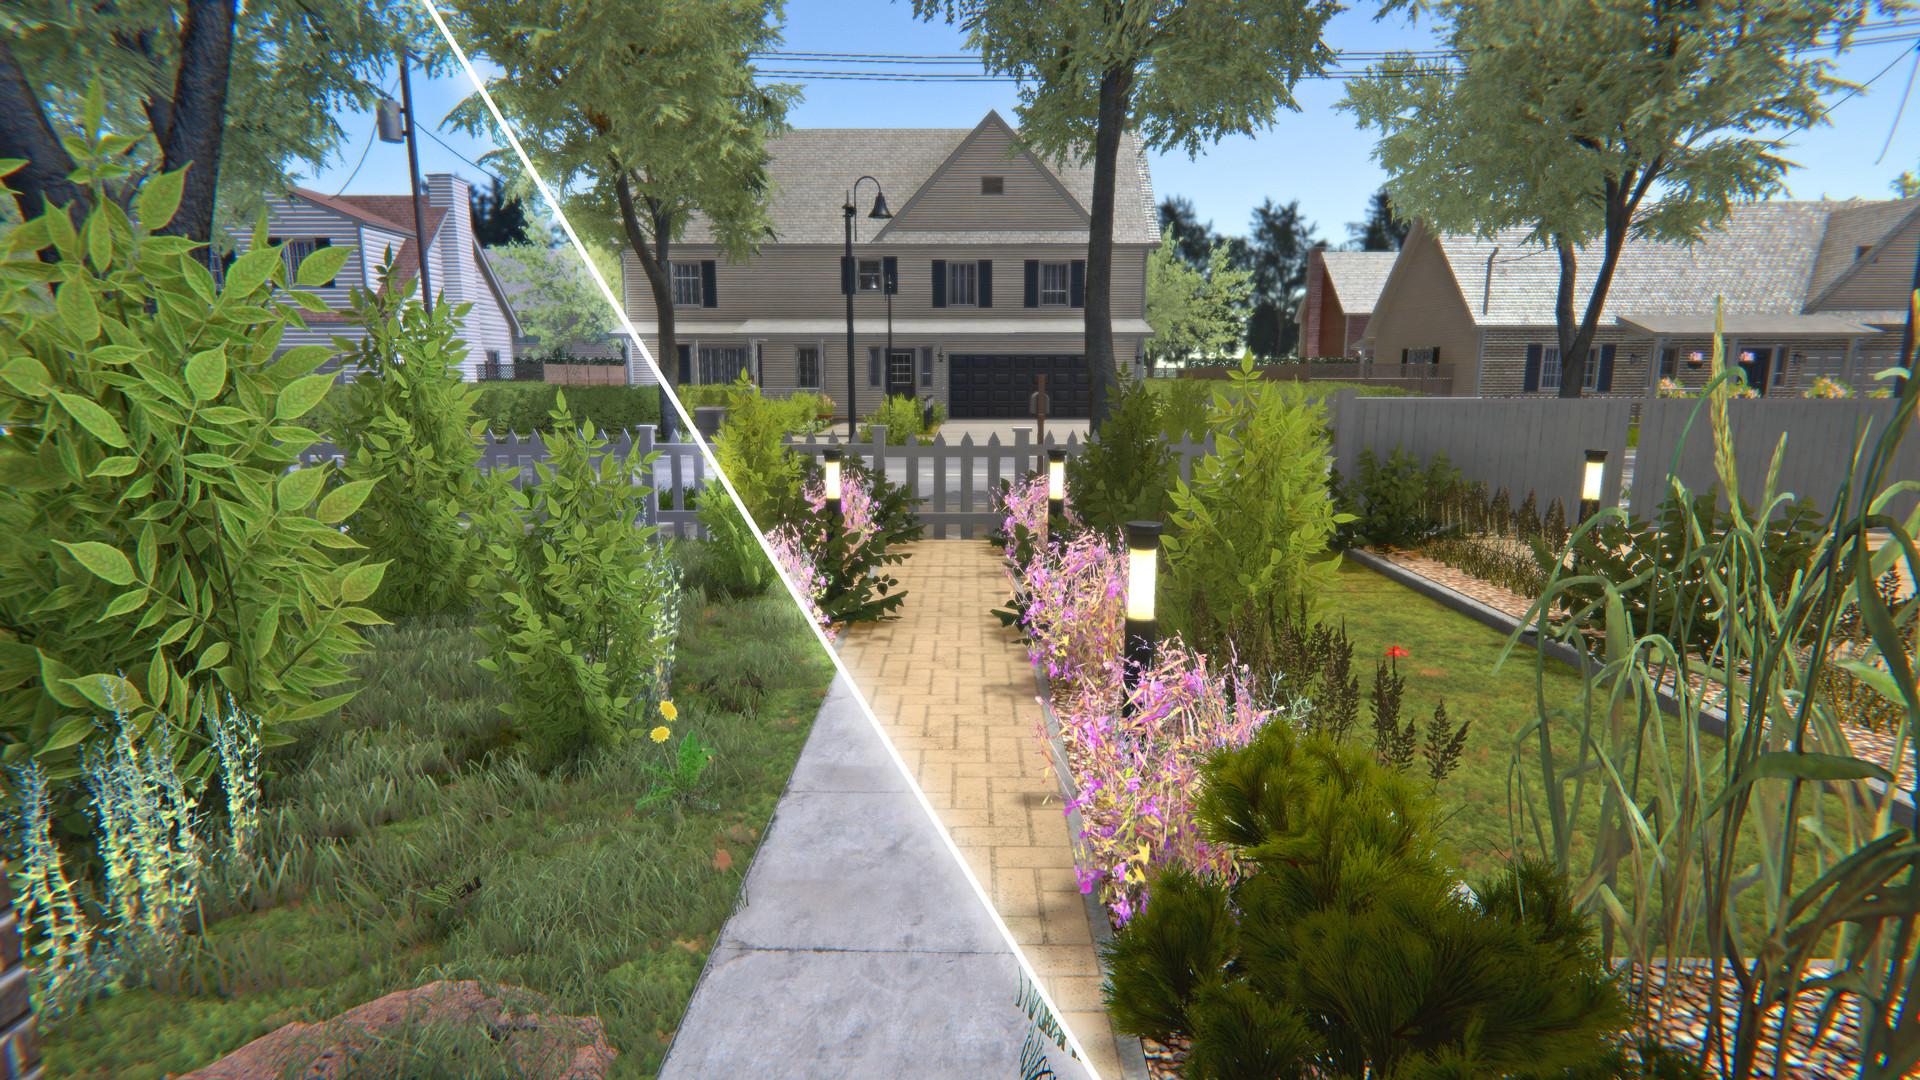 Garden Flipper on Steam on landscaping dothan al, landscaping madison al, landscaping maintenance auburn al,